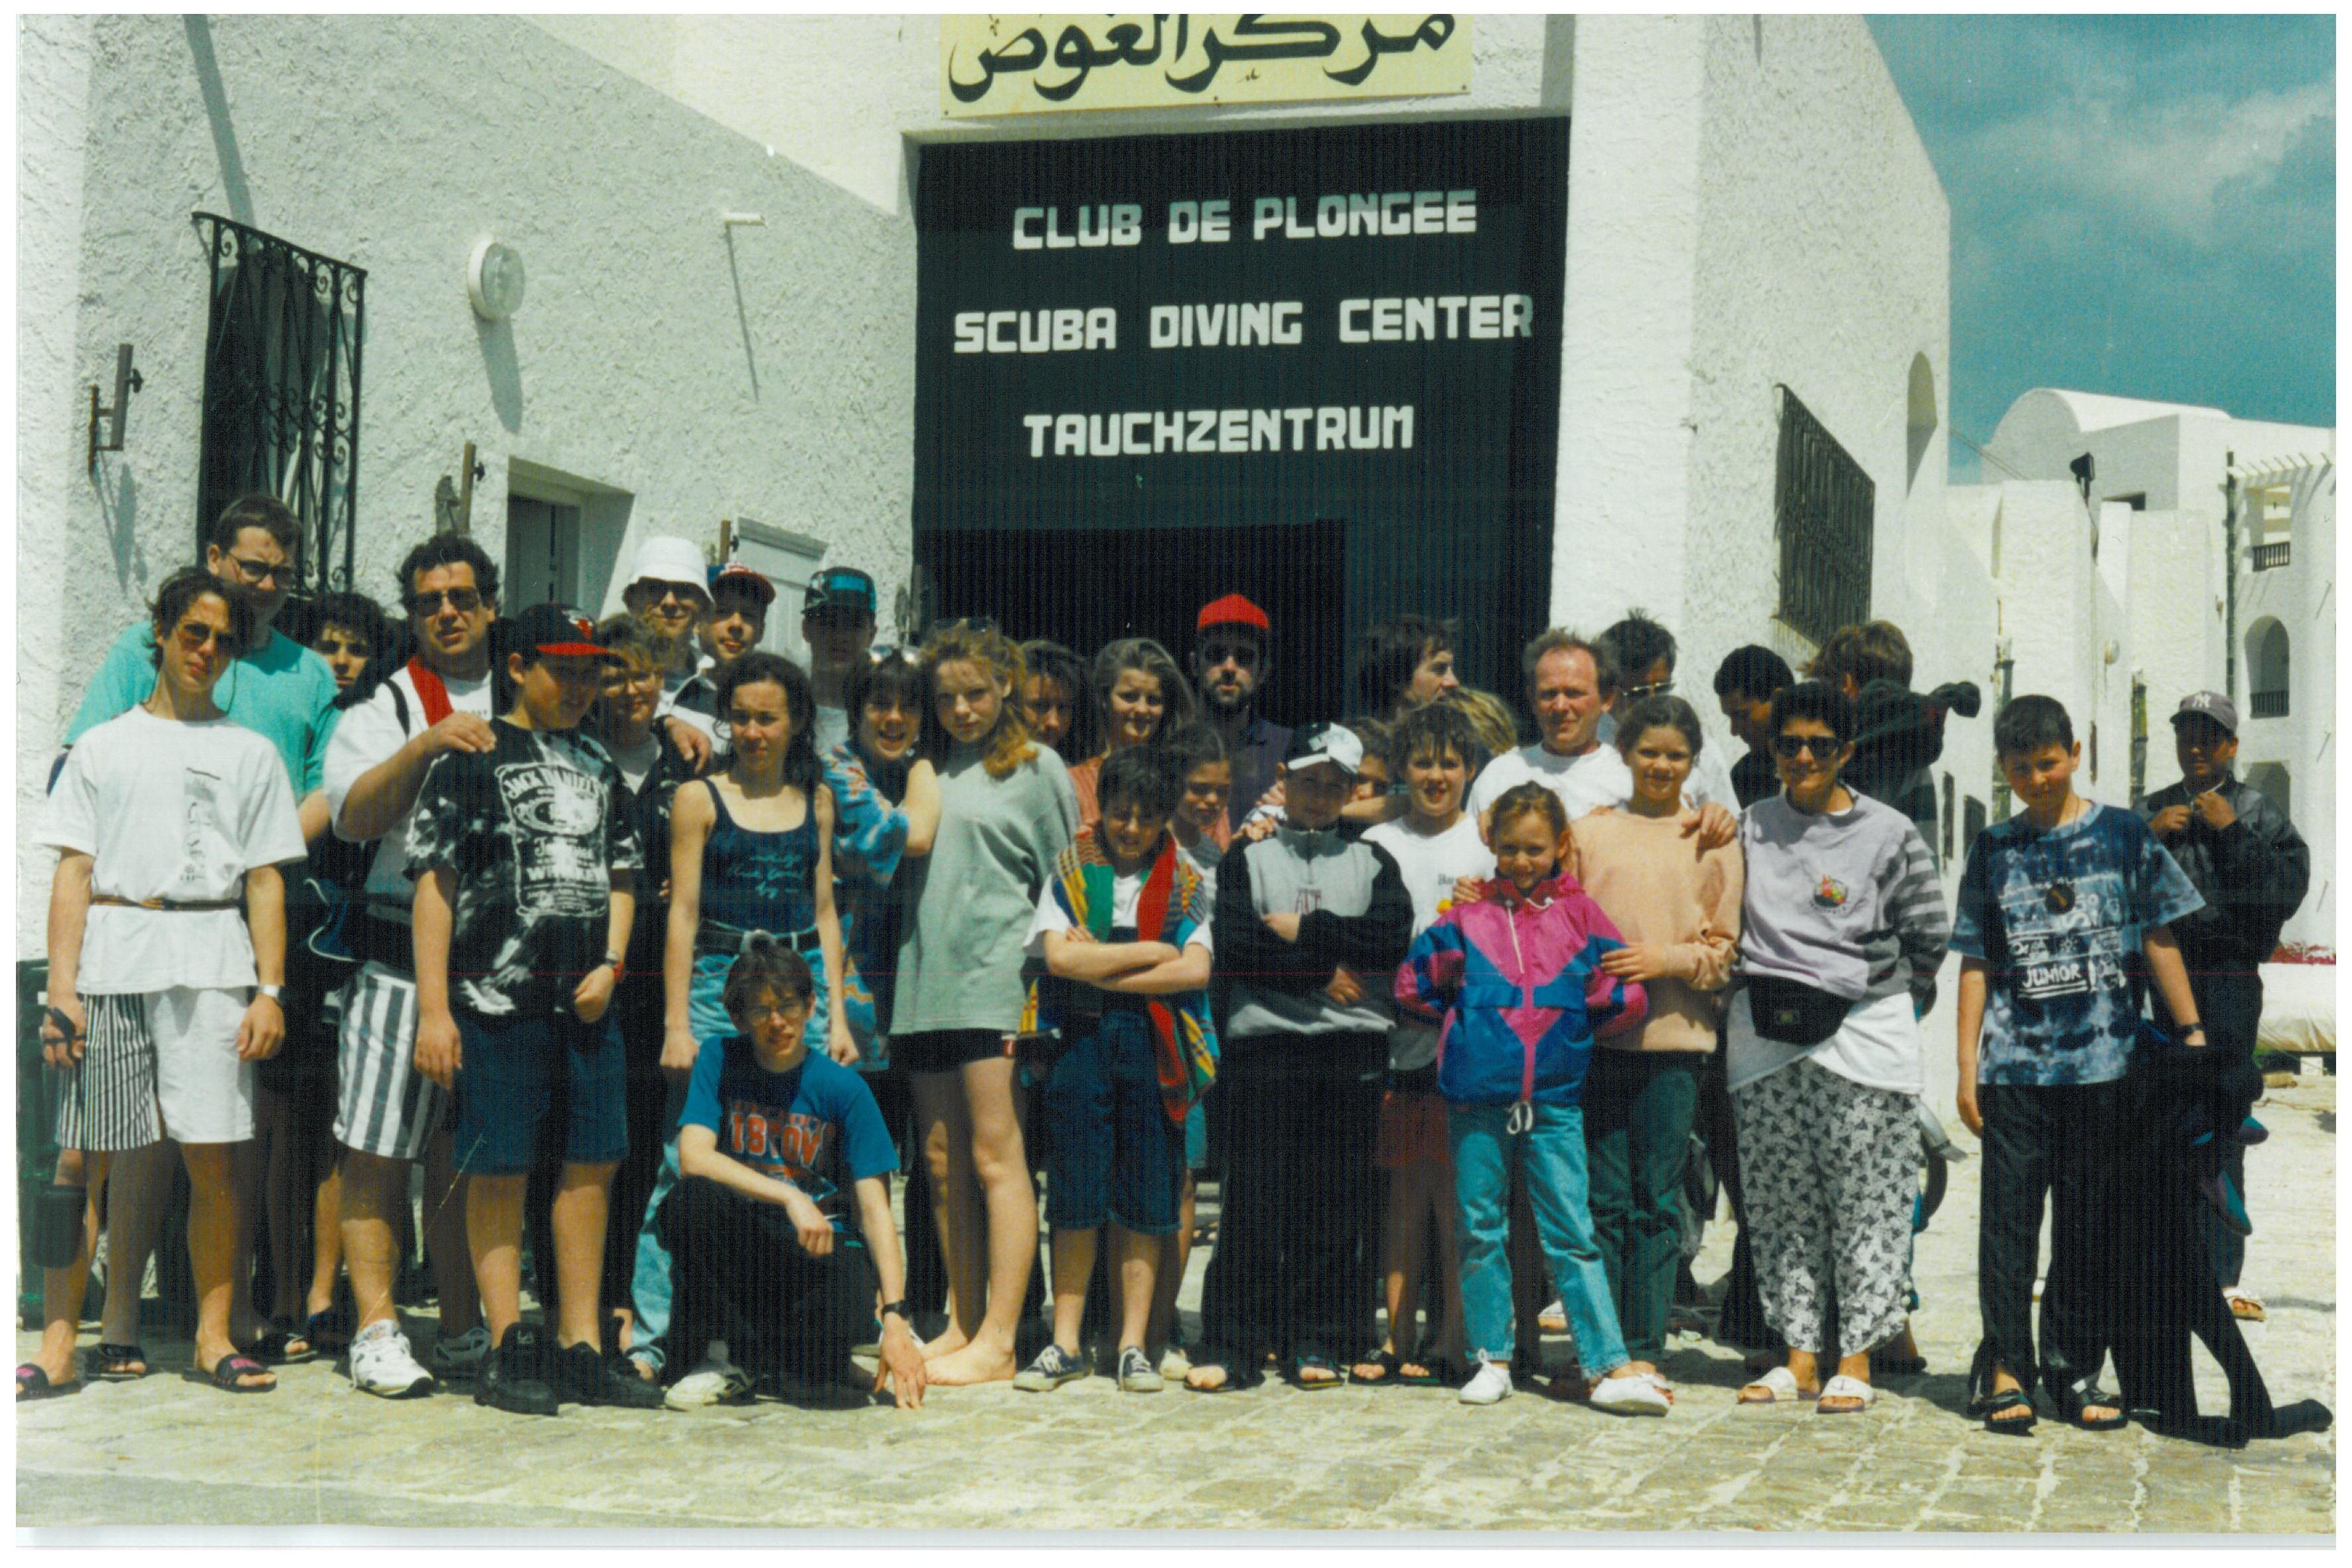 tunisie 95 -24